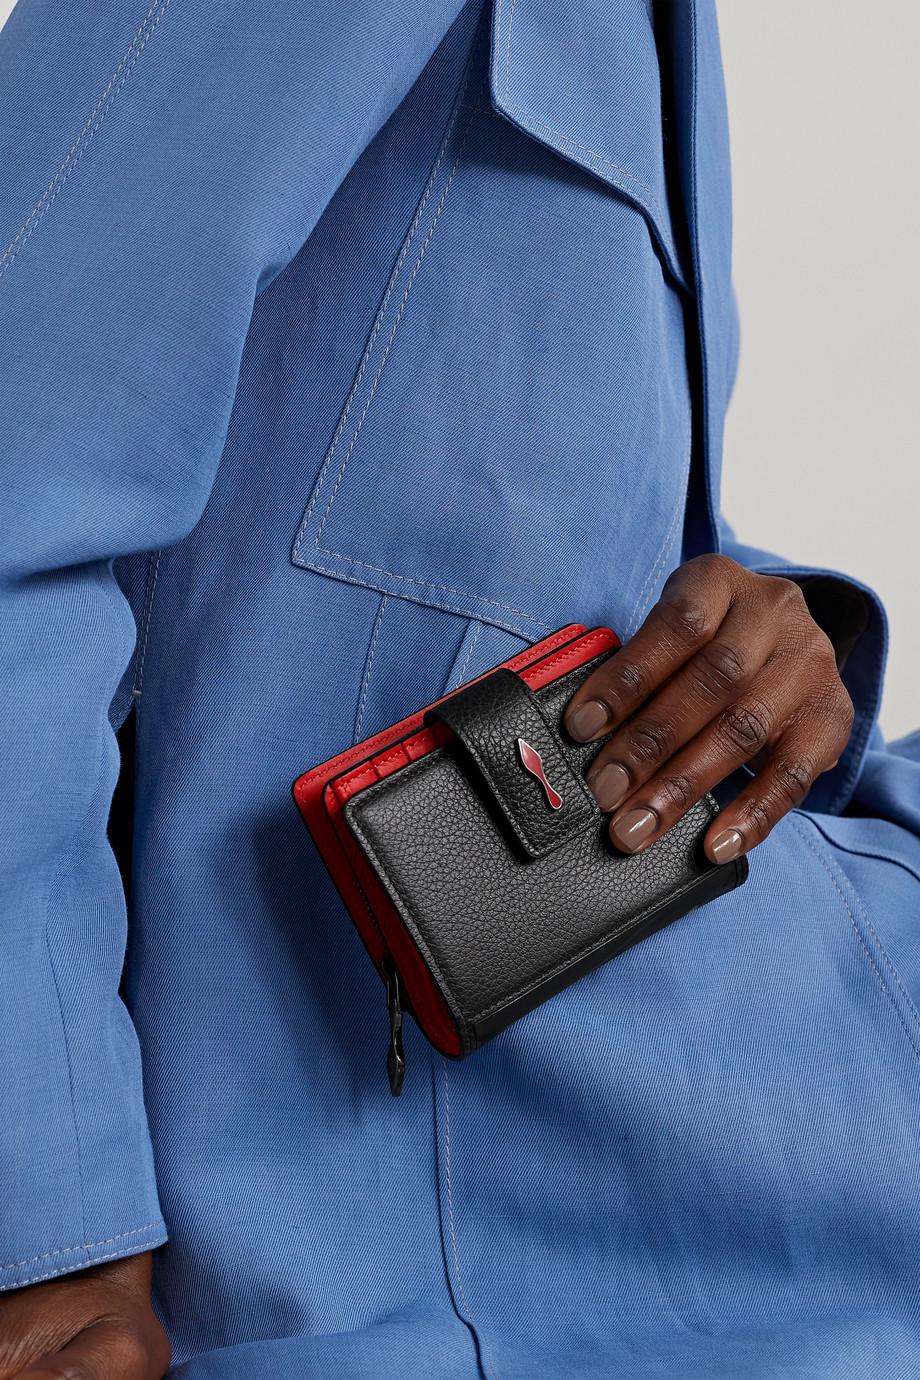 Christian Louboutin Paloma Portemonnaie aus strukturiertem Leder mit Gummibesatz